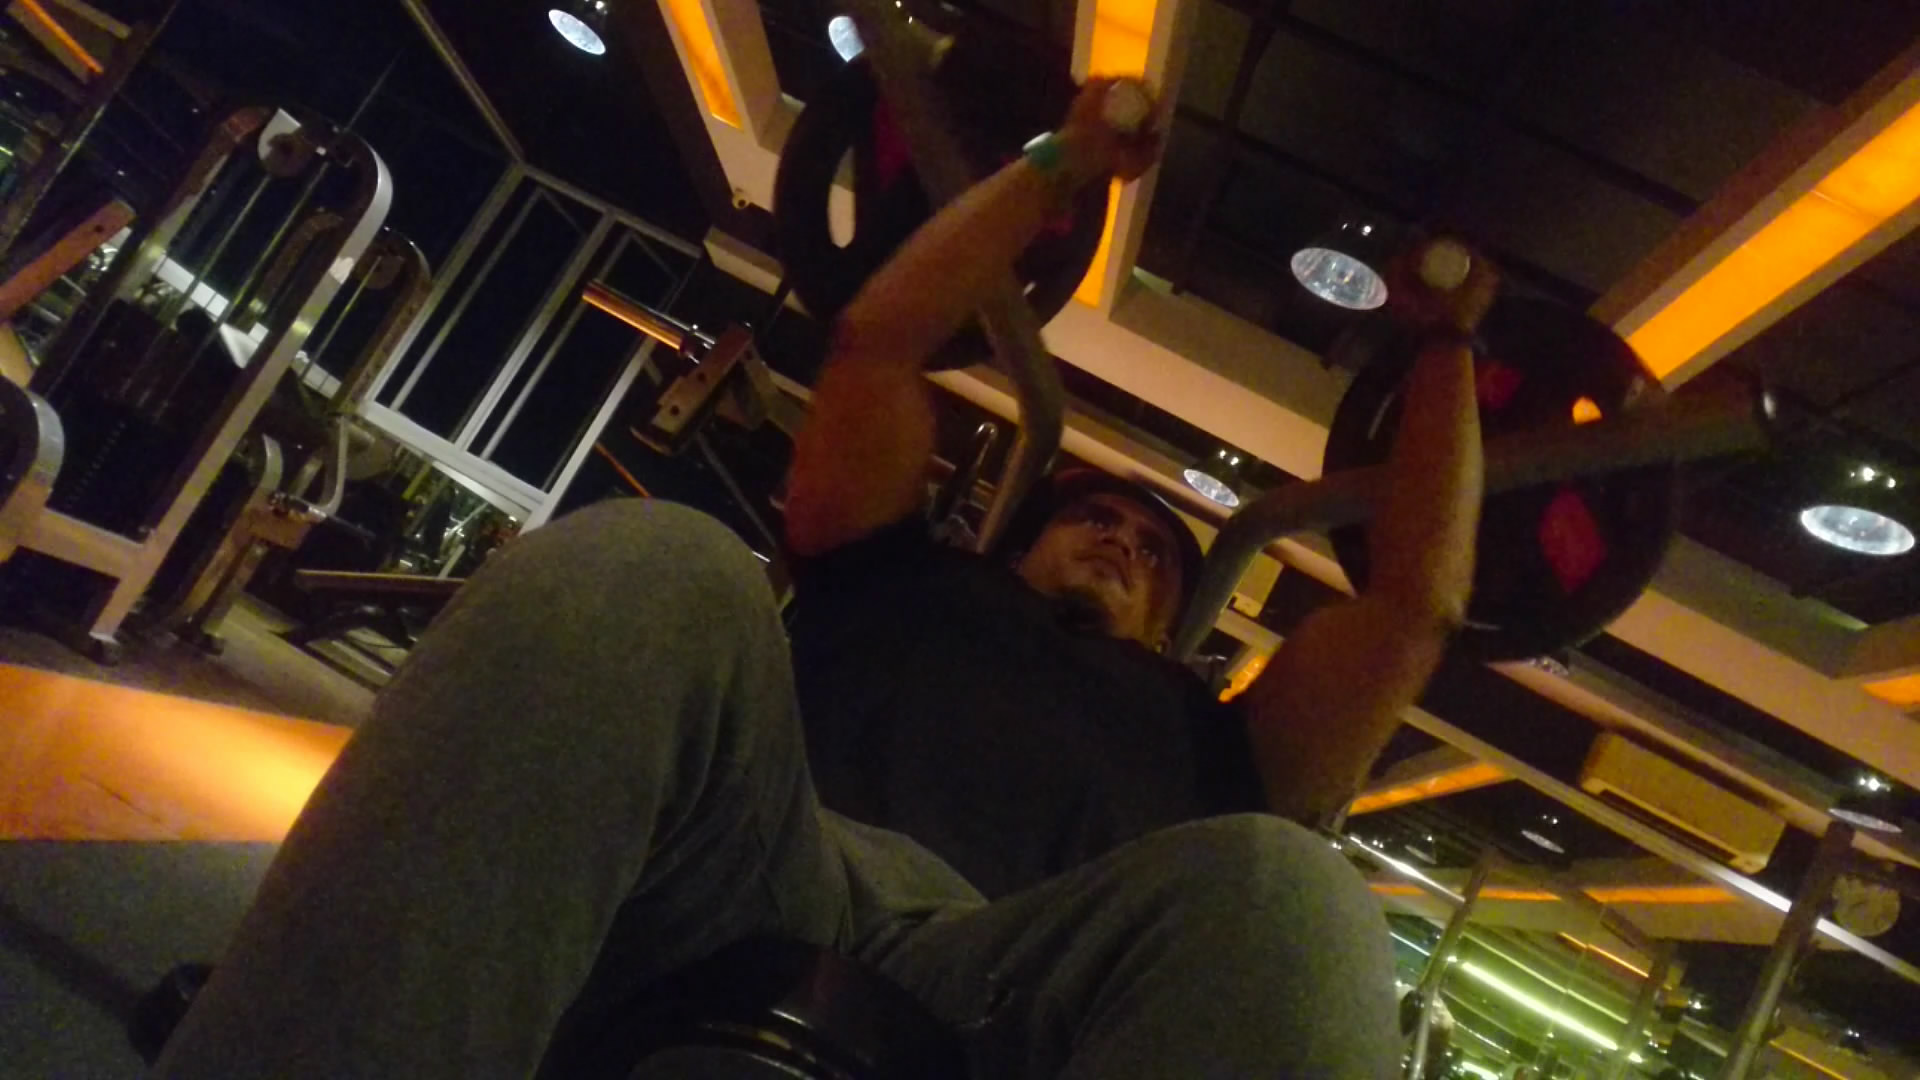 Neo Fitness - Tempat Fitness, Zumba dan Yoga Terlengkap di Pekanbaru